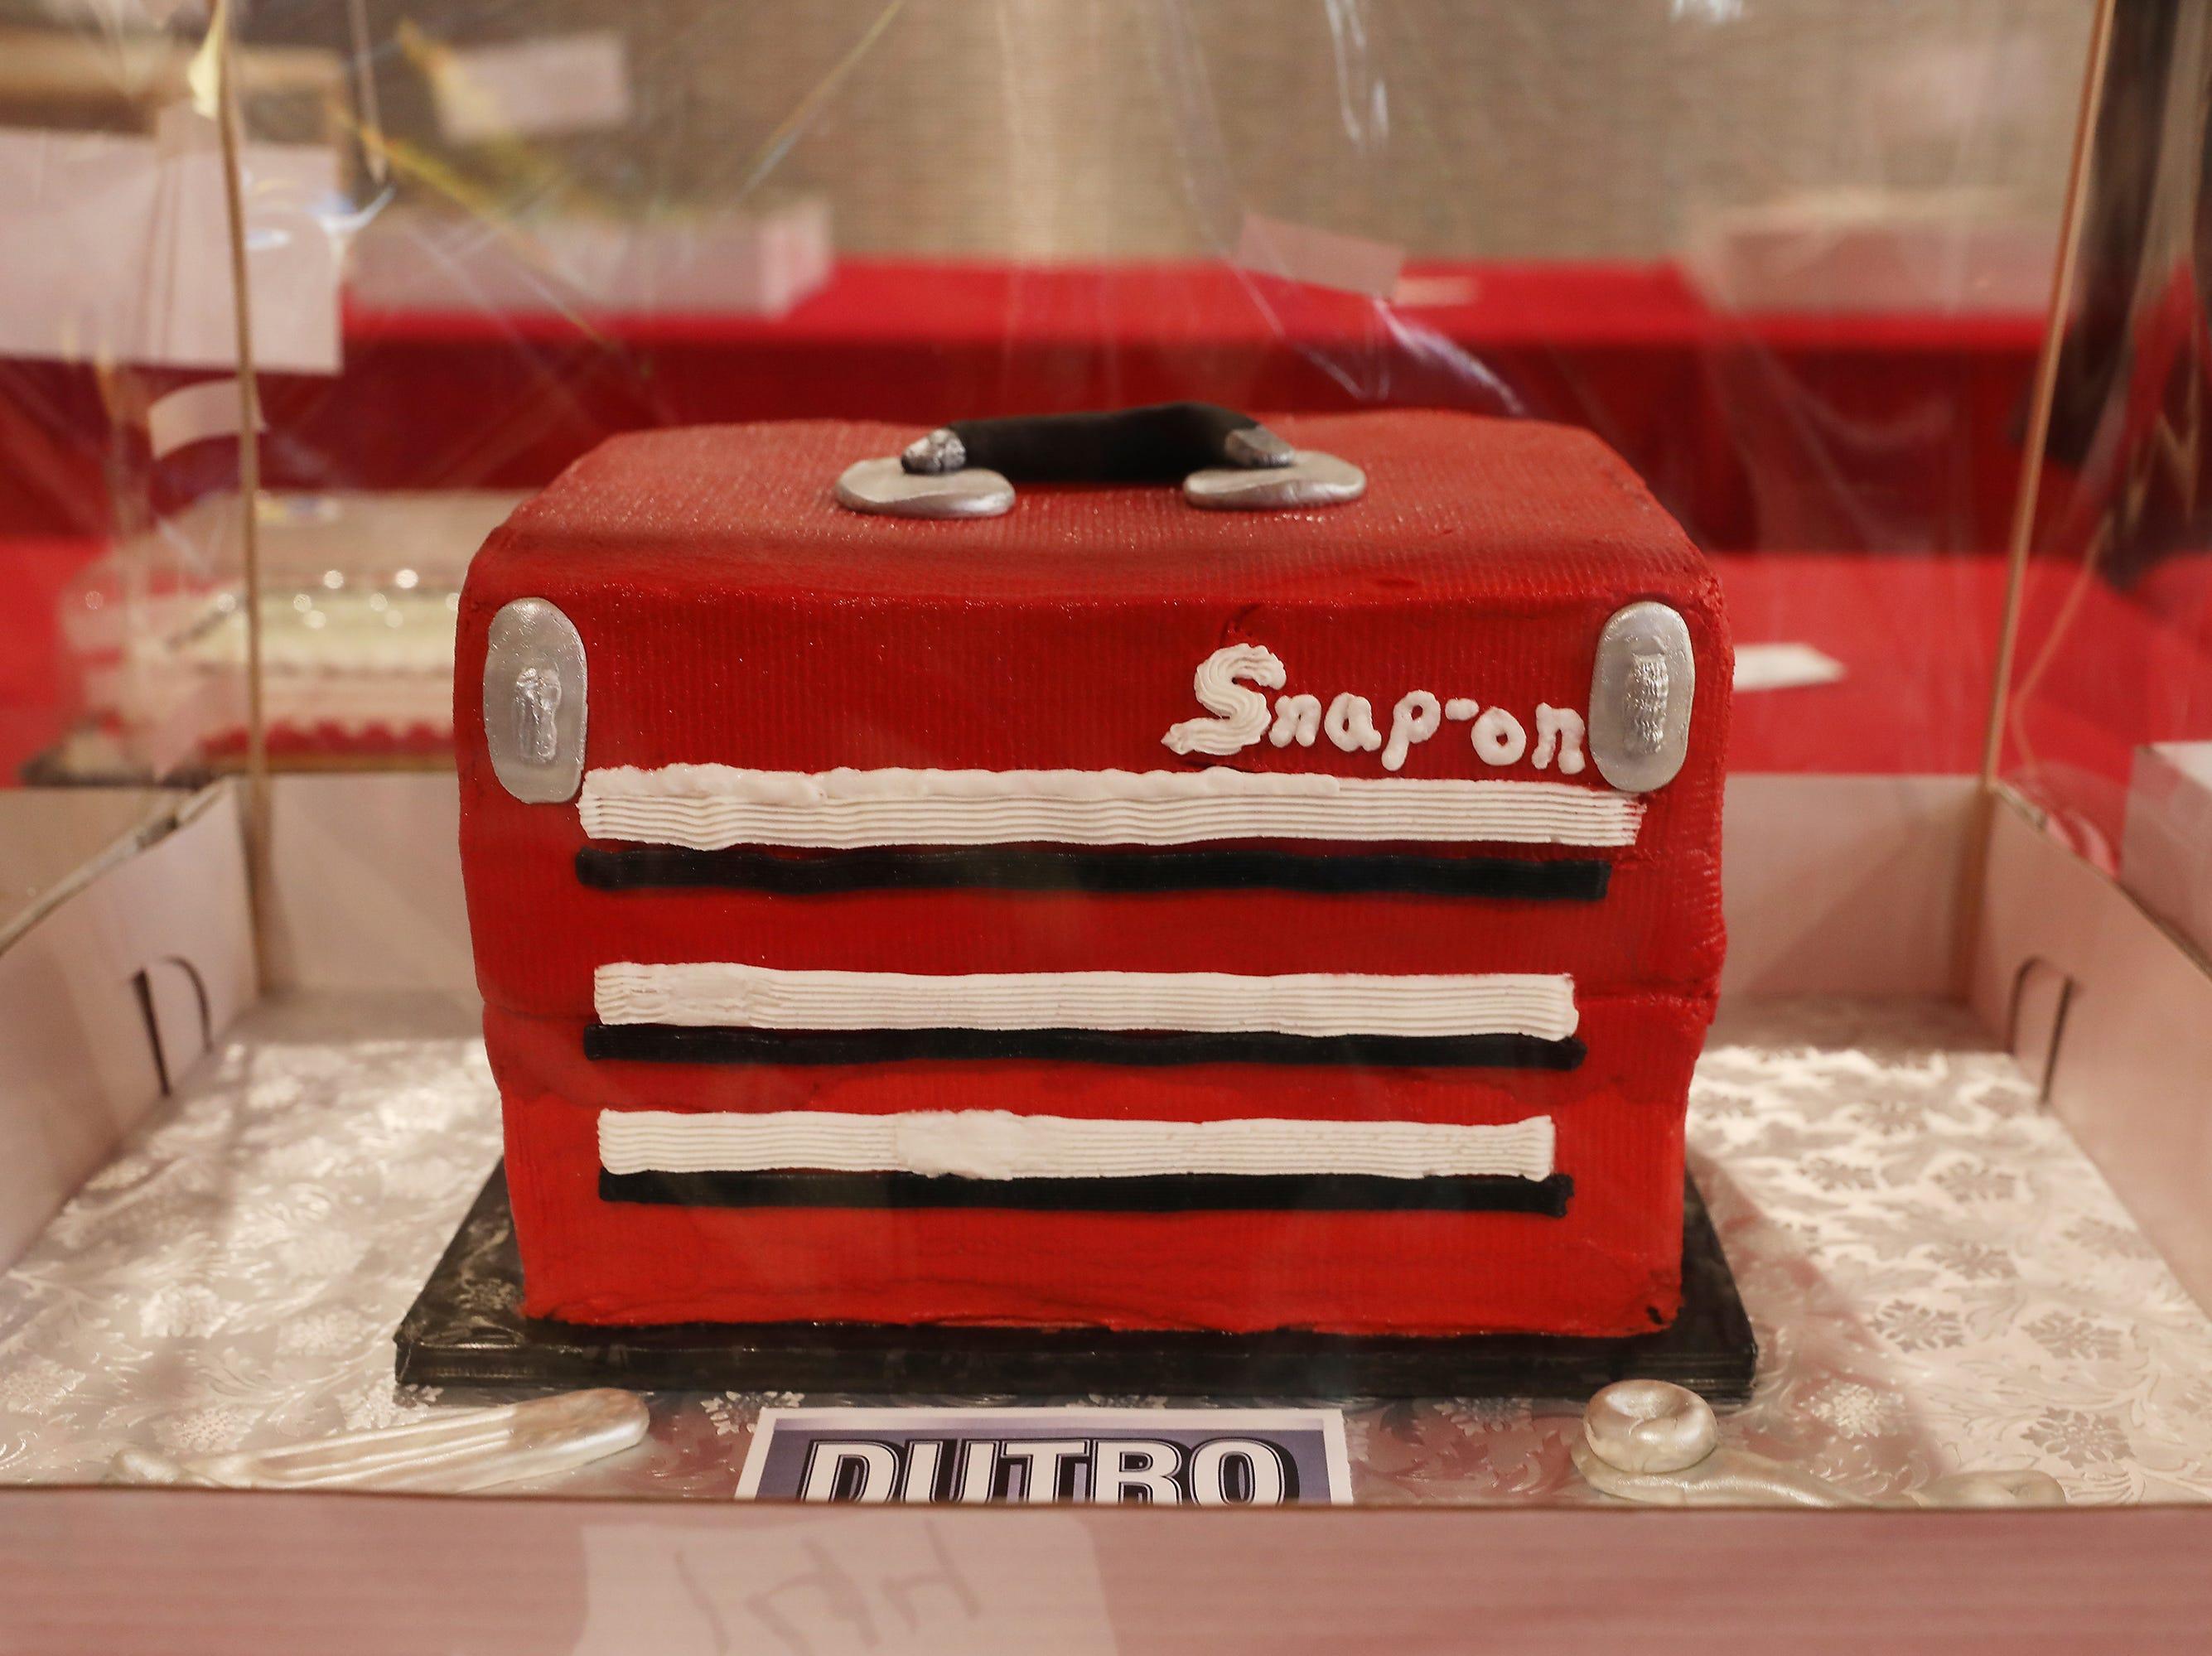 3:00 P.M. Thursday cake 144 Dutro Ford - $300 gift card to Topgolf